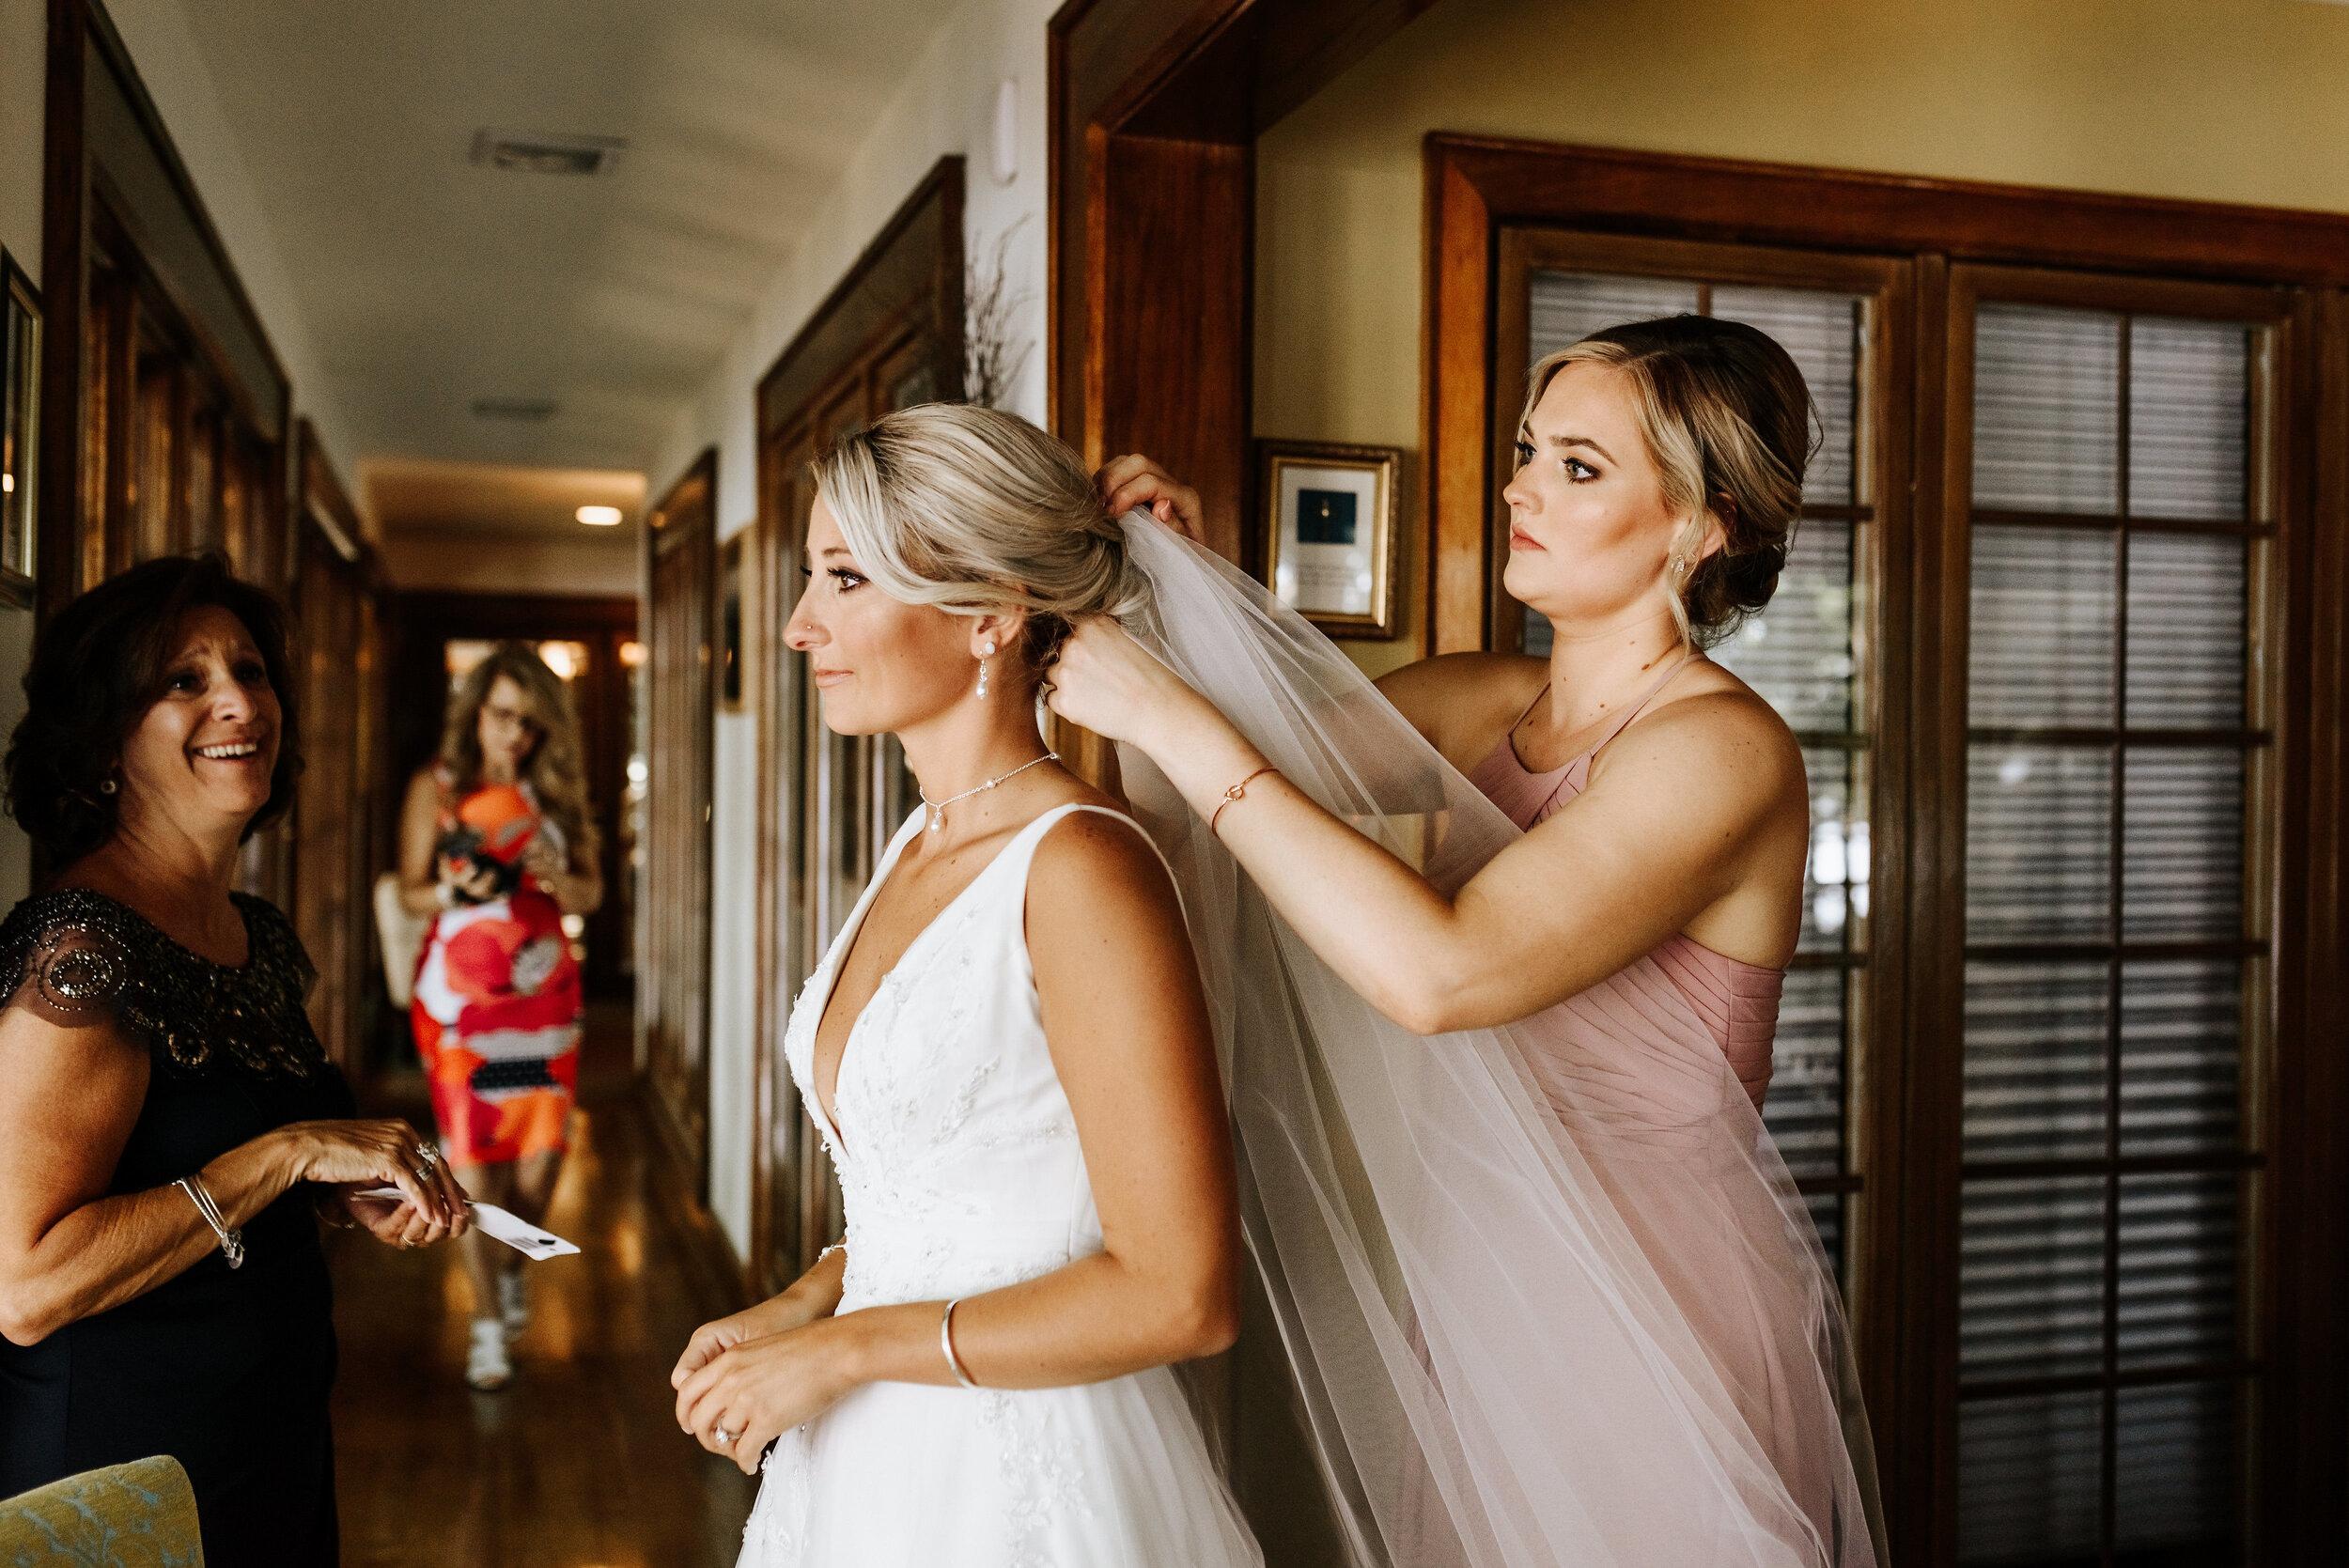 Emily_Mike_Wedding_Celebrations_at_the_Reservoir_Pool_Pavilion_Richmond_Virginia_Wedding_Photographer_Photography_by_V_19.jpg